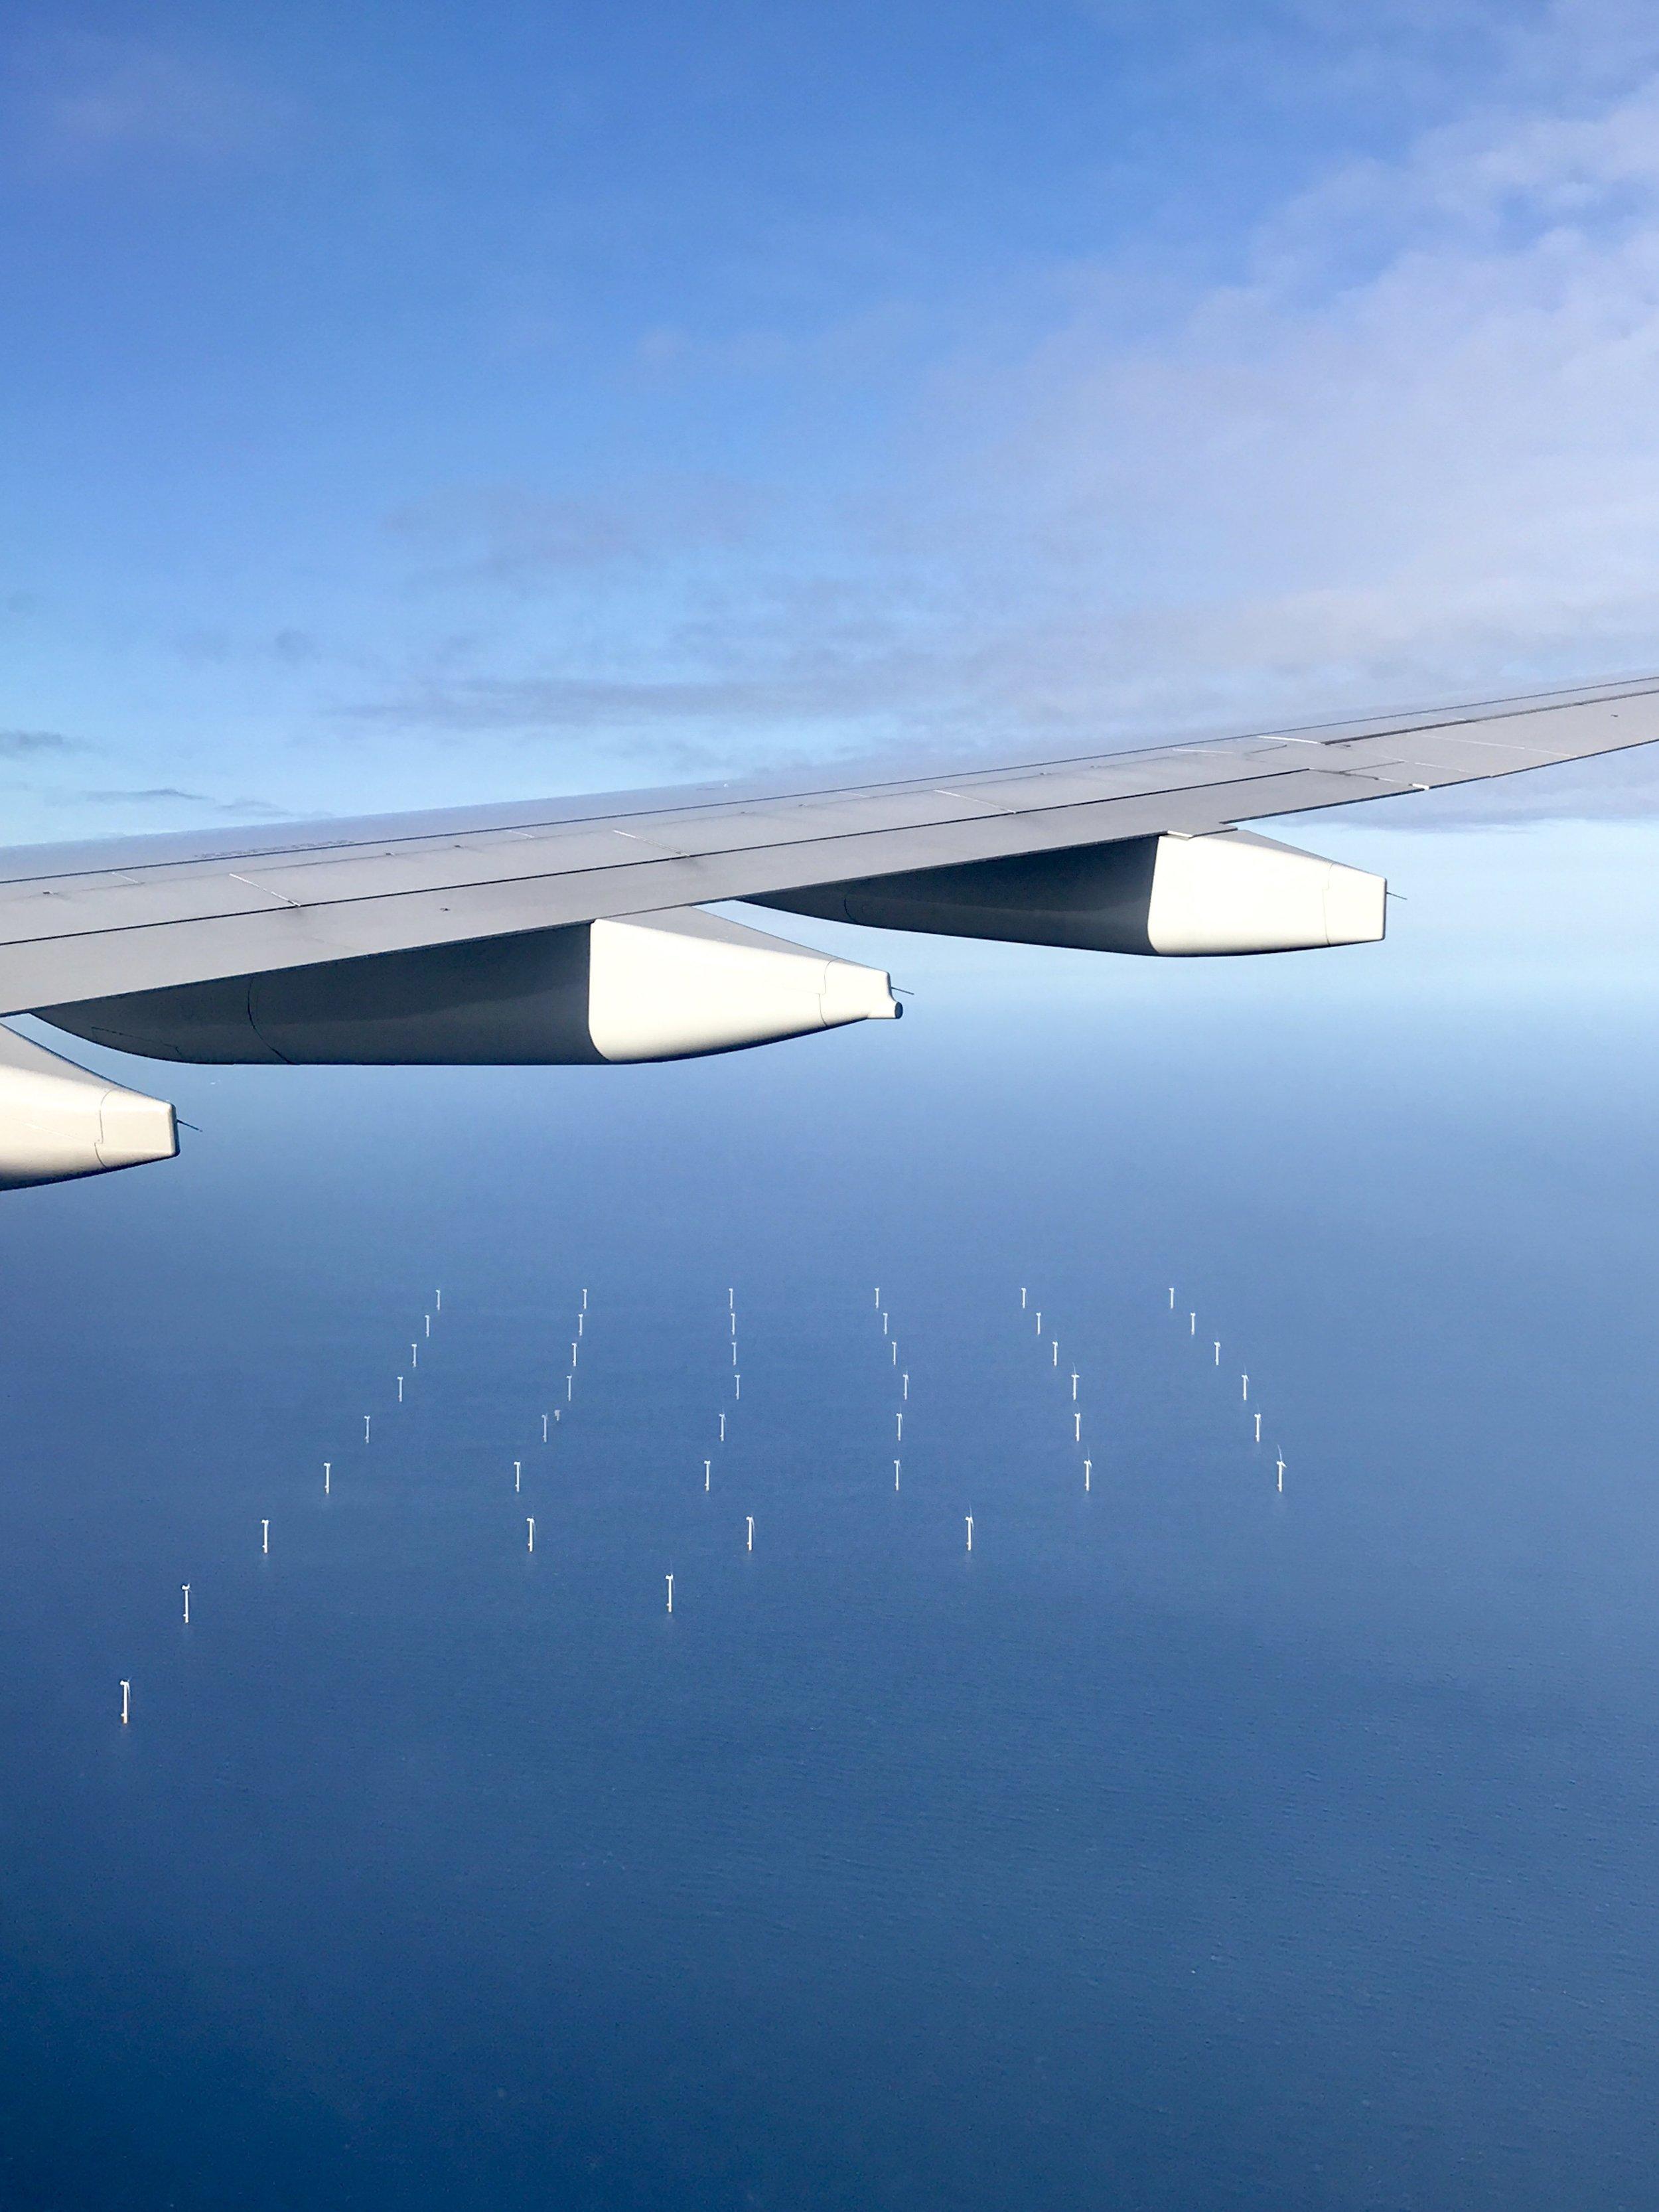 windmills in water near Amsterdam